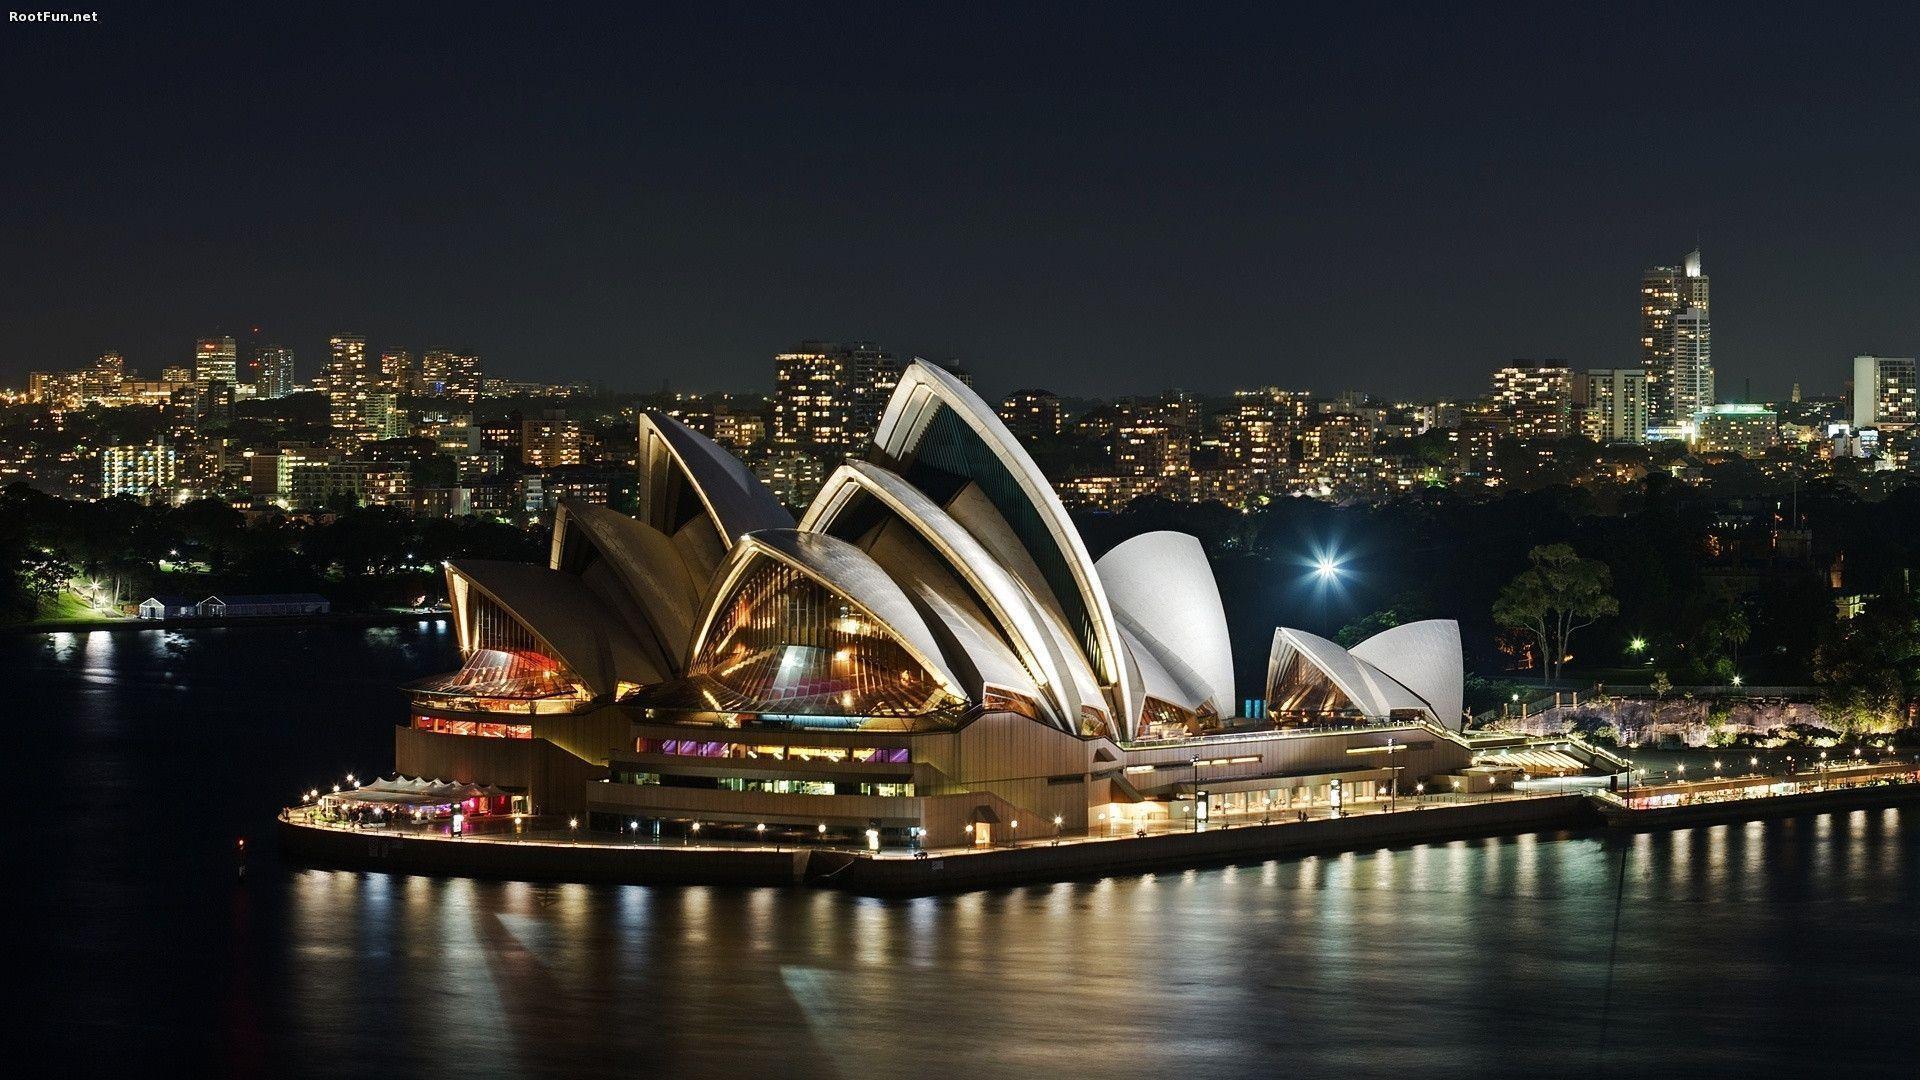 House Wallpaper Opera Sydney World Places Travel Images - Sydney Opera House , HD Wallpaper & Backgrounds